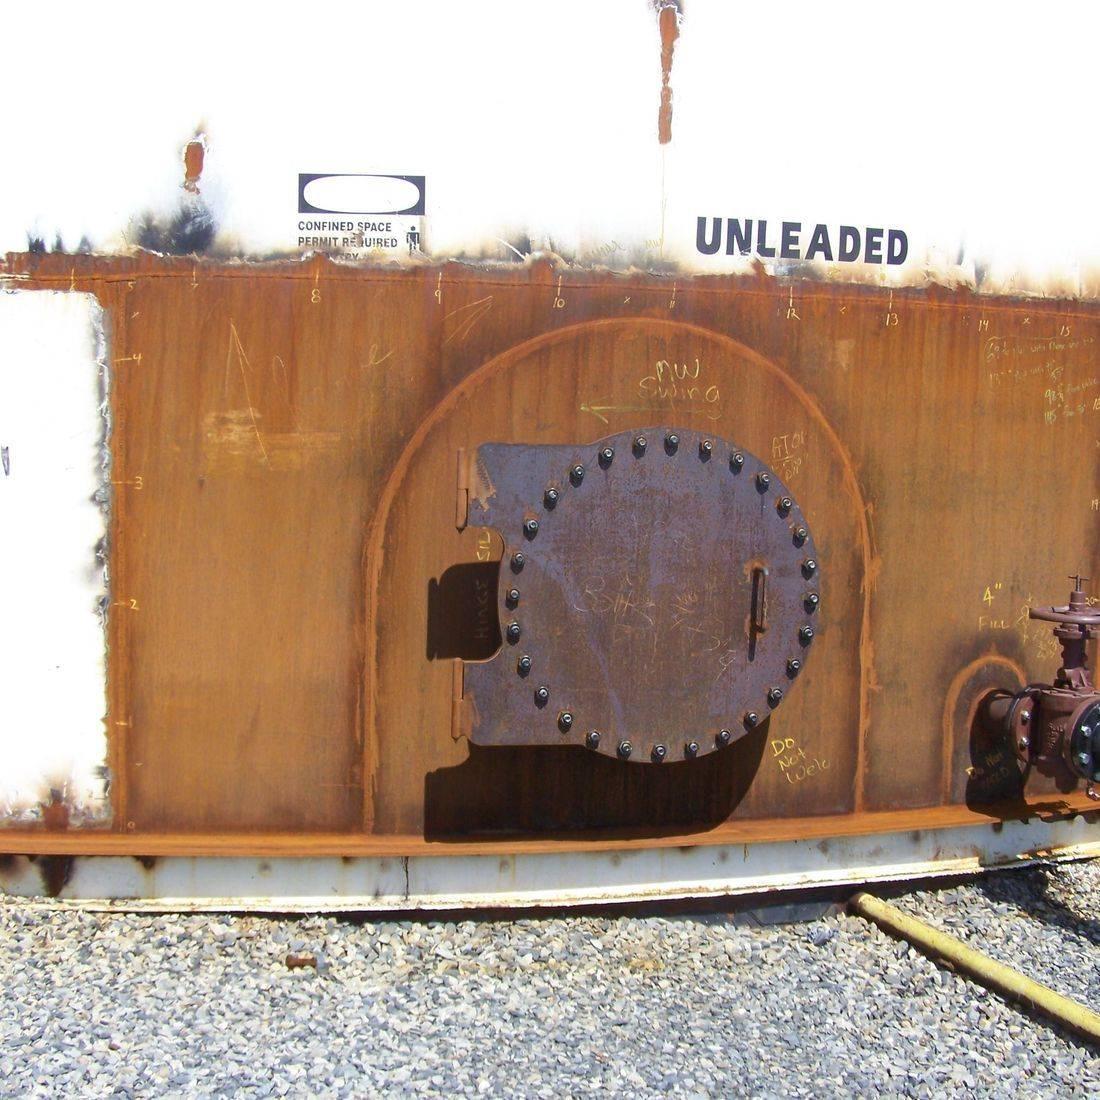 API 653 Steel storage tank repair; addition of foam chamber flange to top of storage tank.